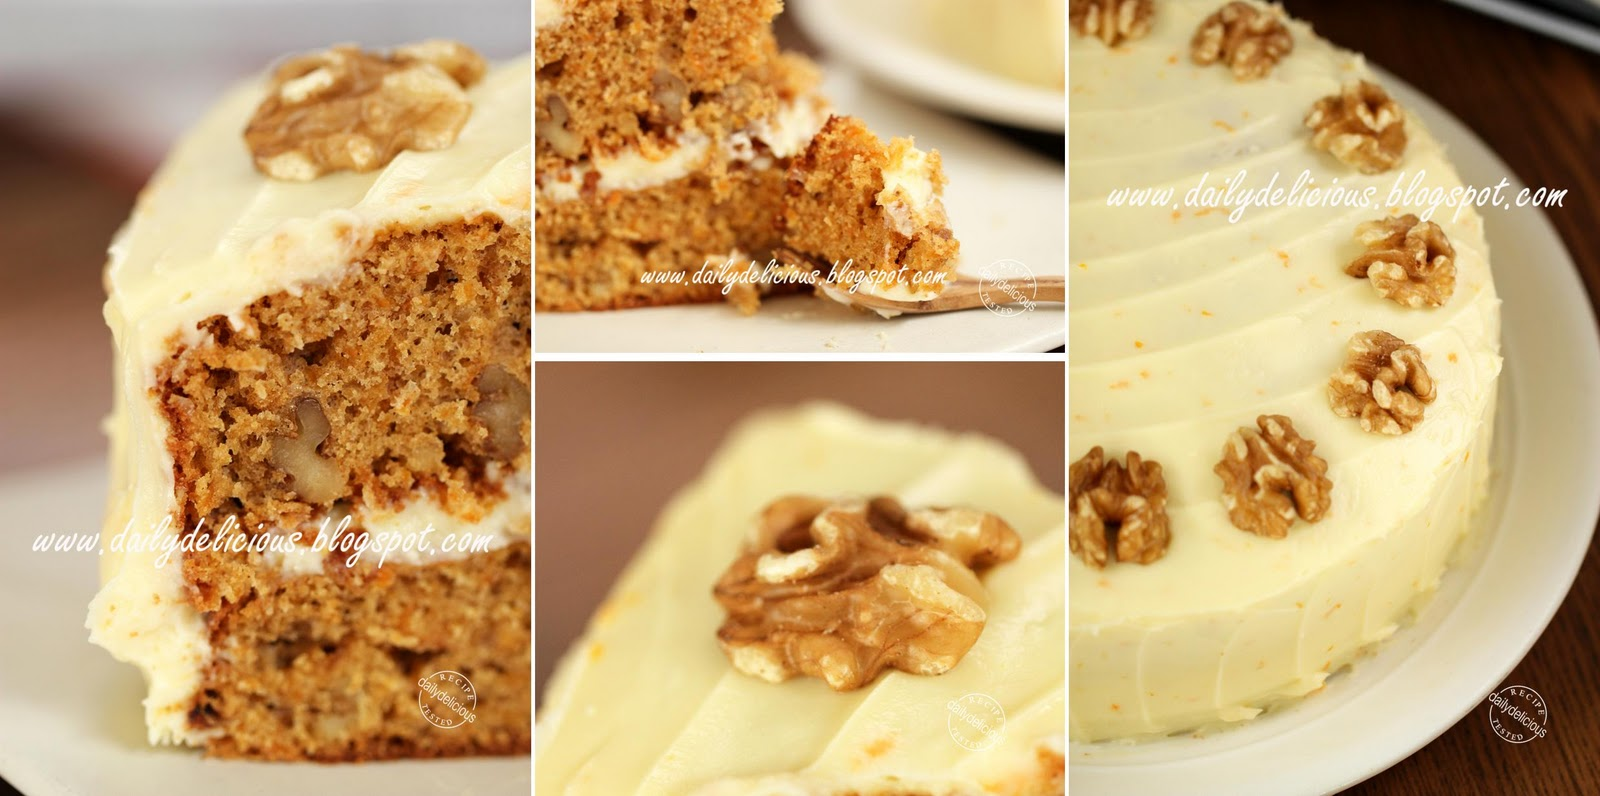 Carrot Walnut Cake Recipe Singapore